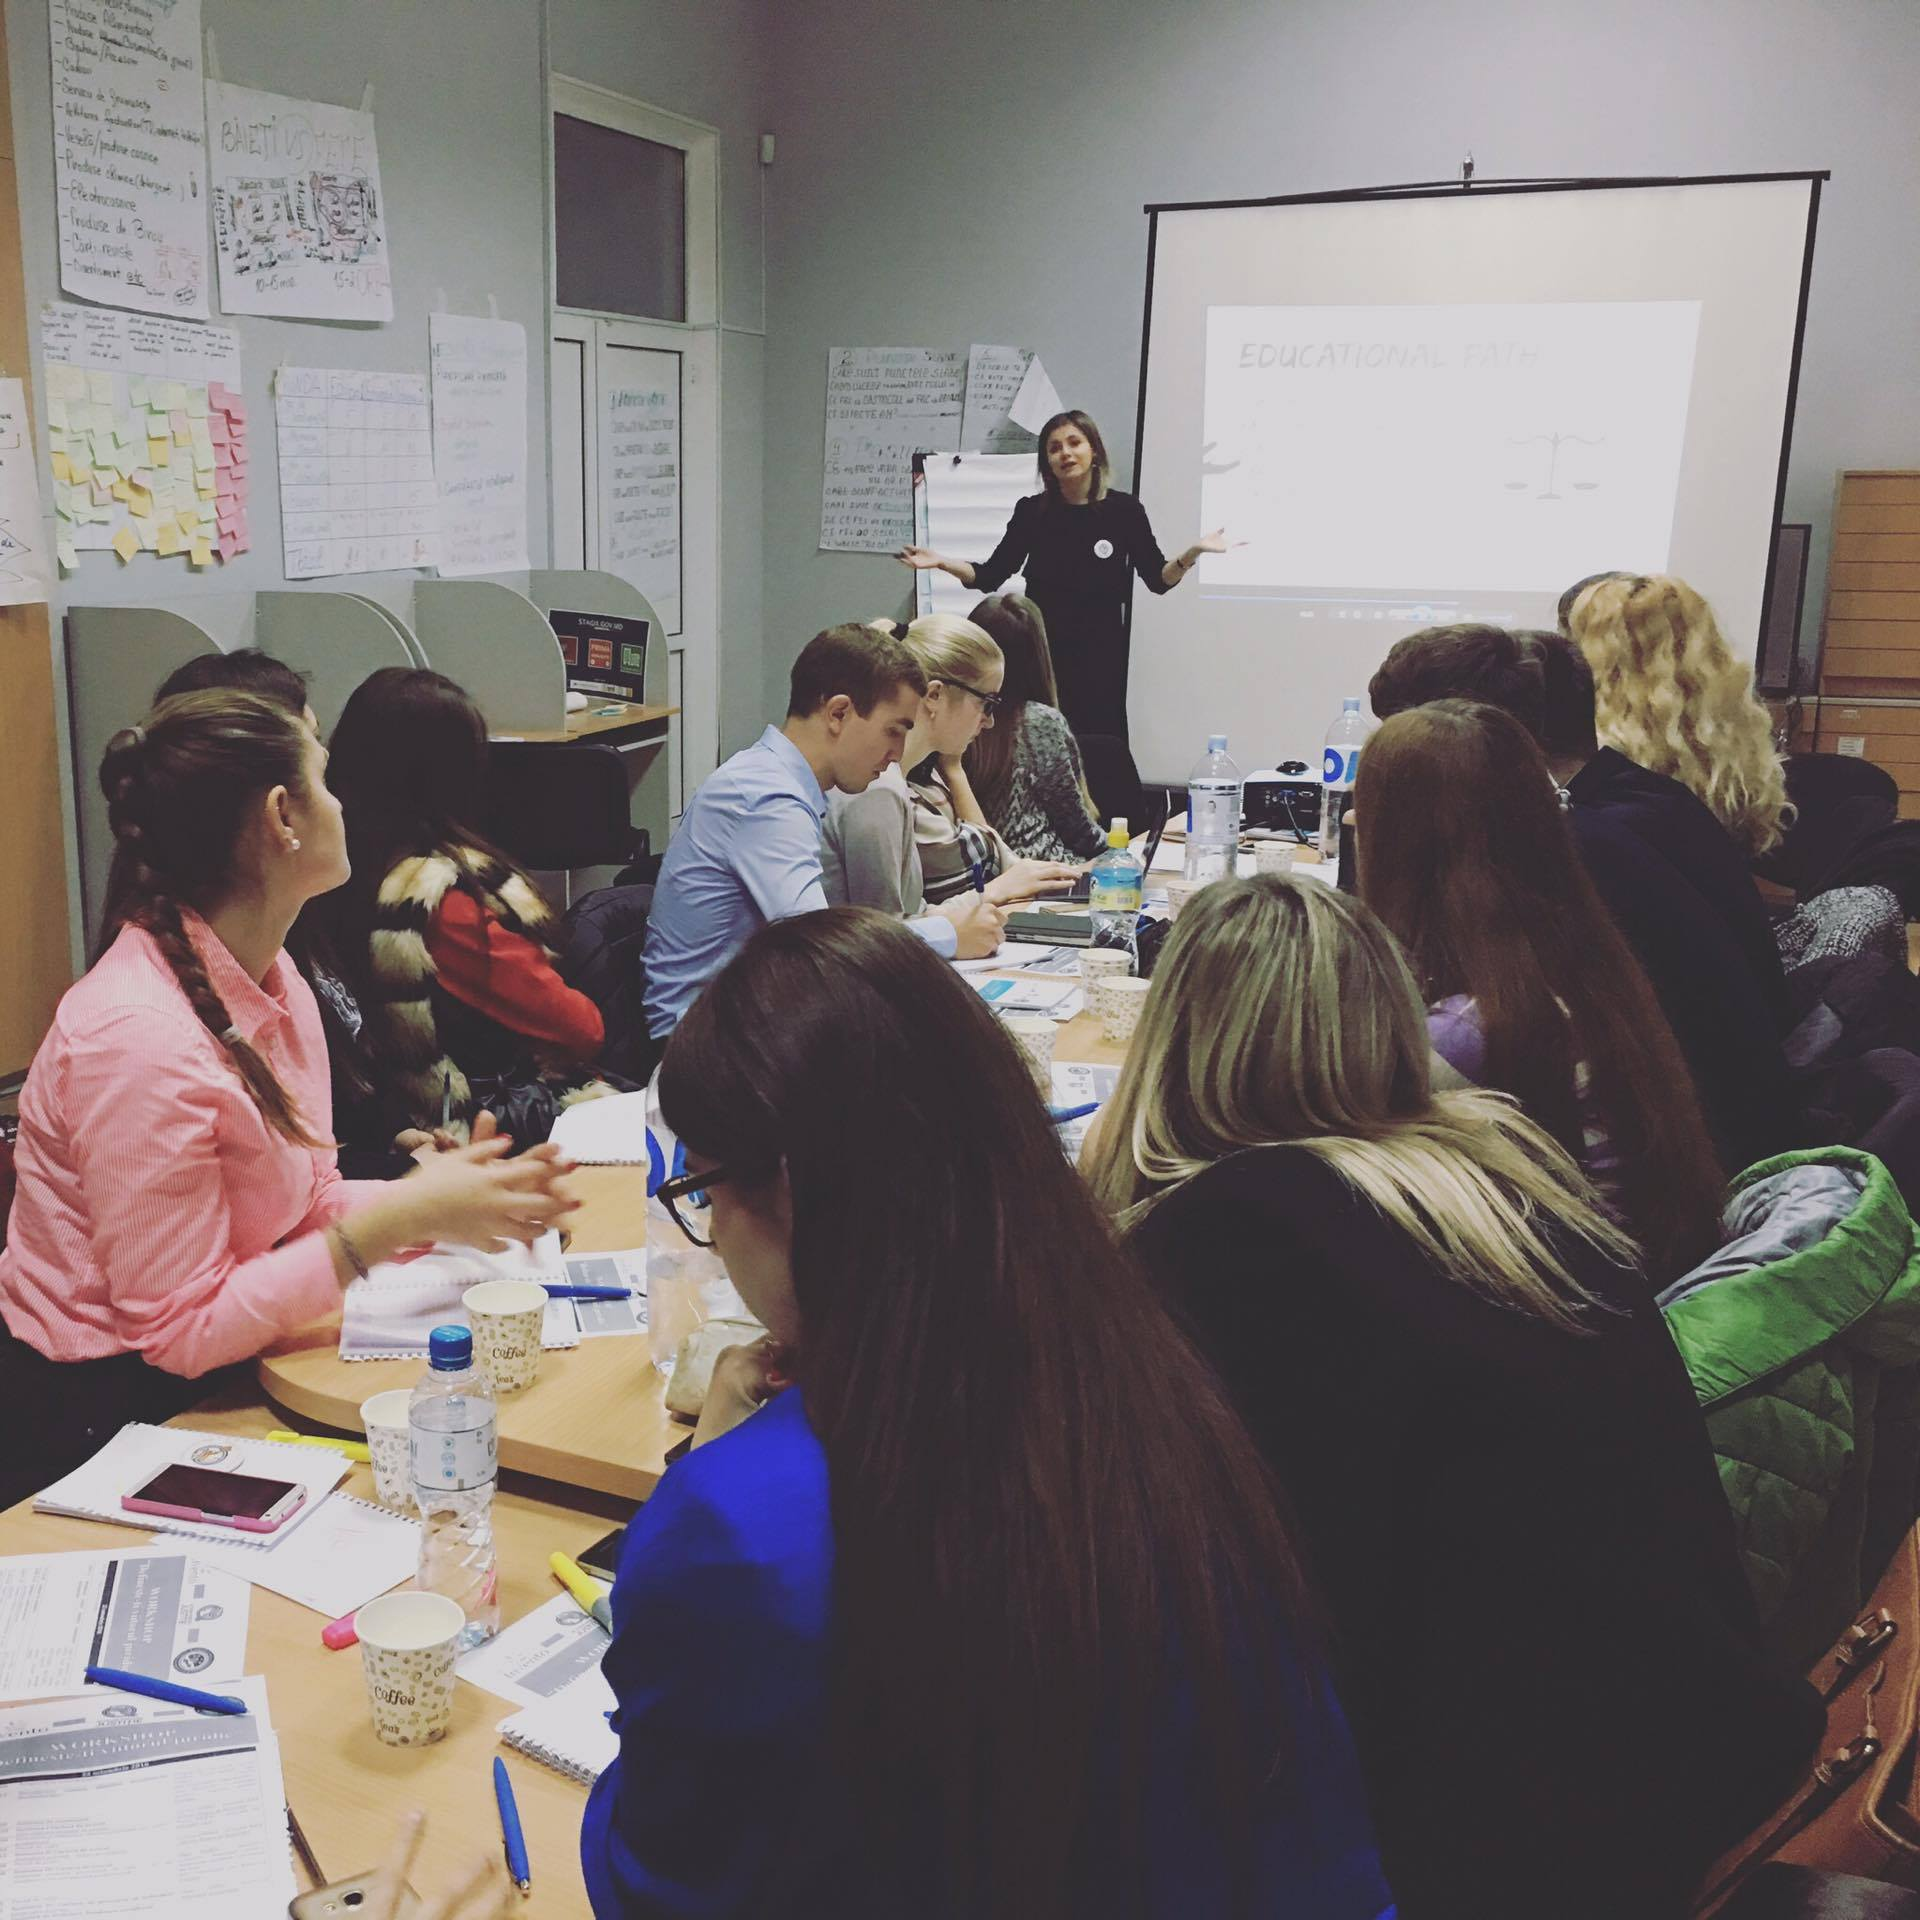 AcțiunePentruJustiție_workshop